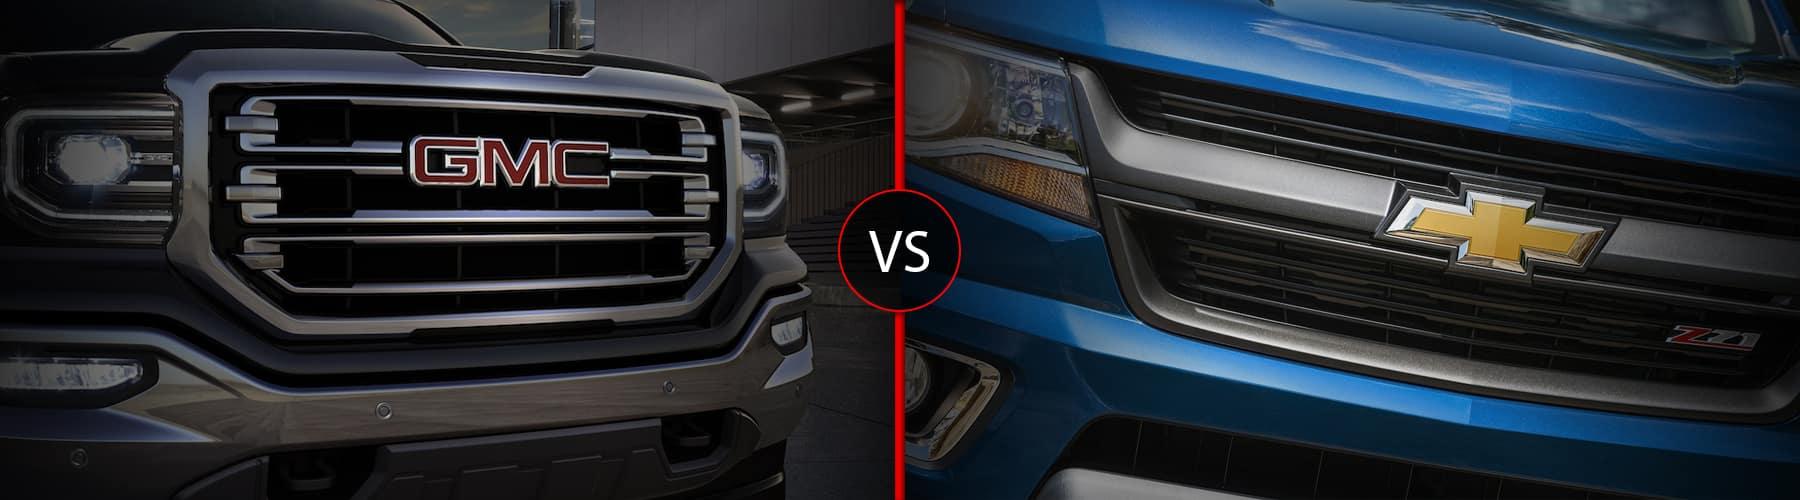 GMC vs Chevy